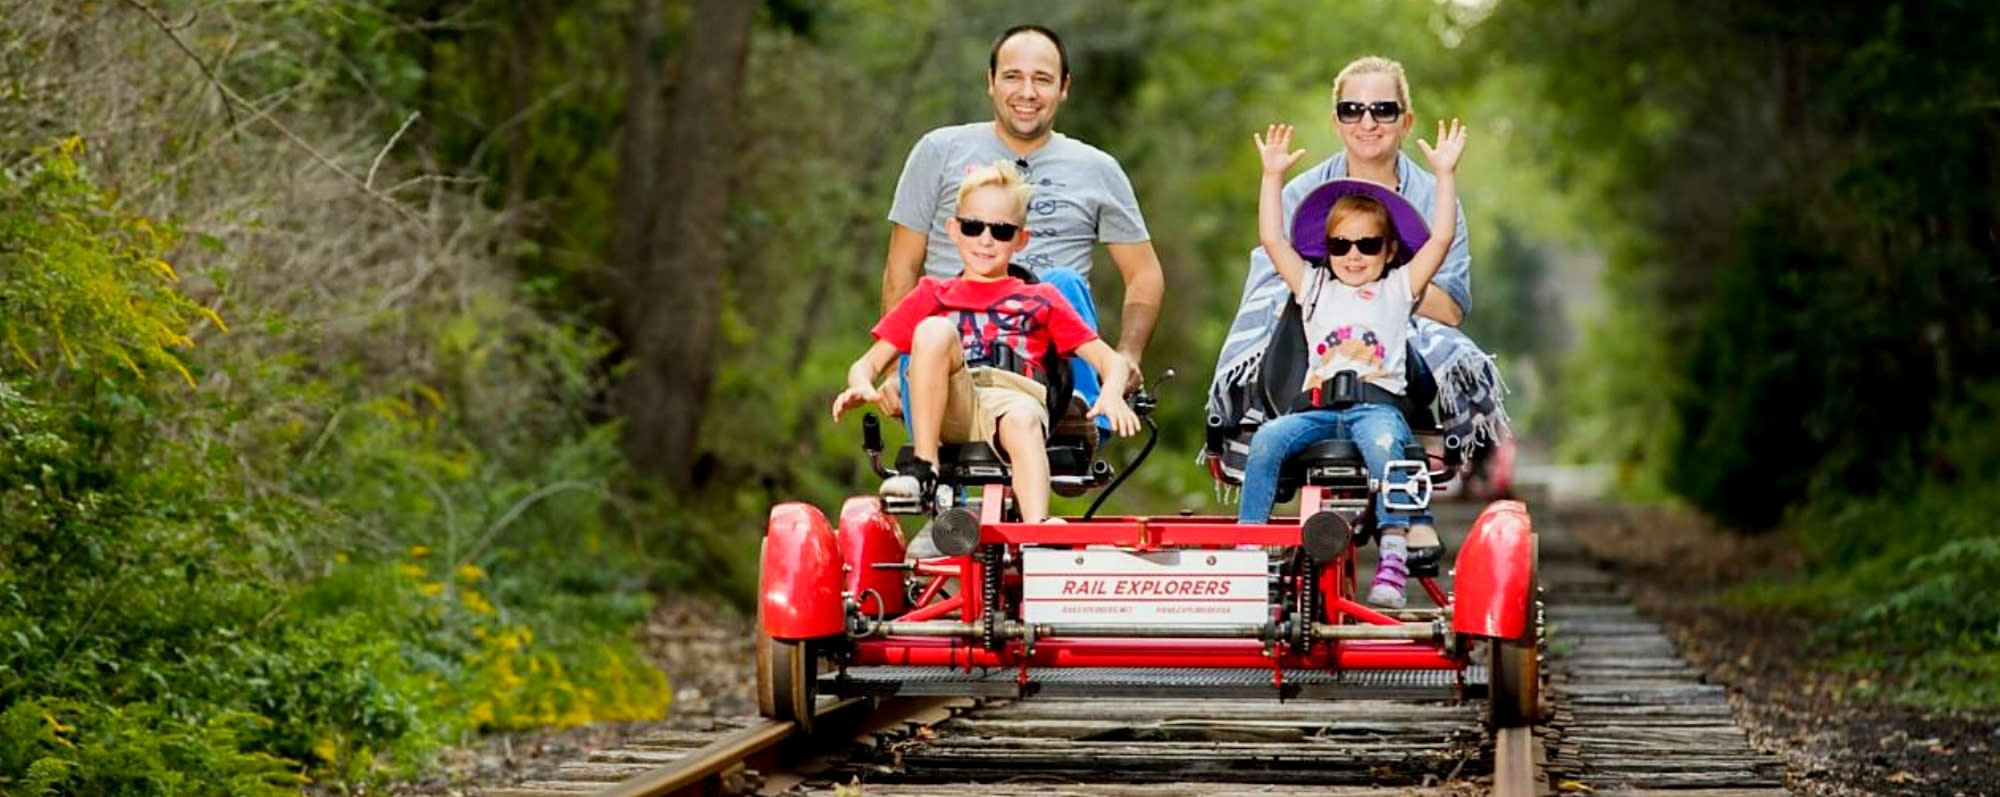 Rail Explorers in Catskills